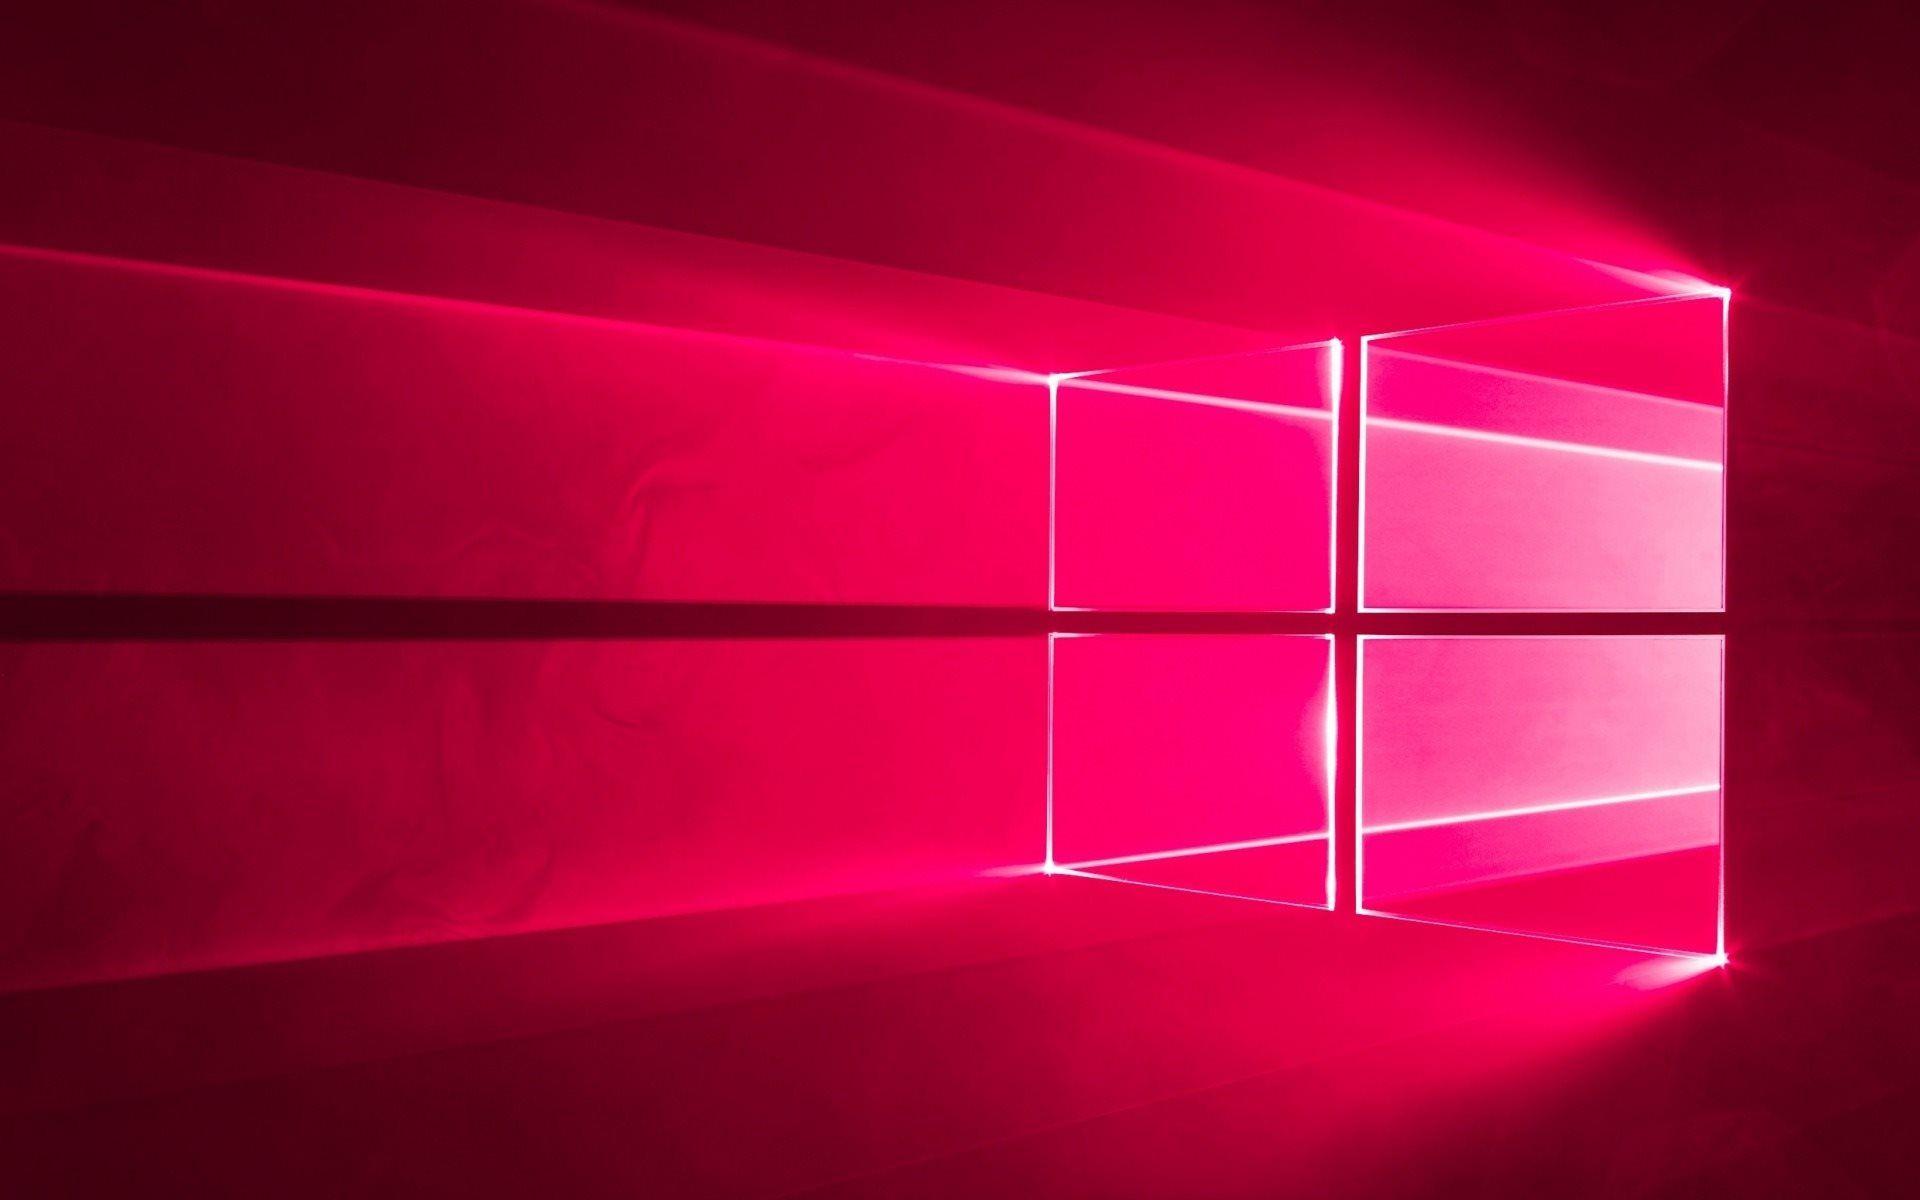 Windows 10 Pink Neon Logo Operating System Windows Plano De Fundo Pc Planos De Fundo Walpaper Para Pc